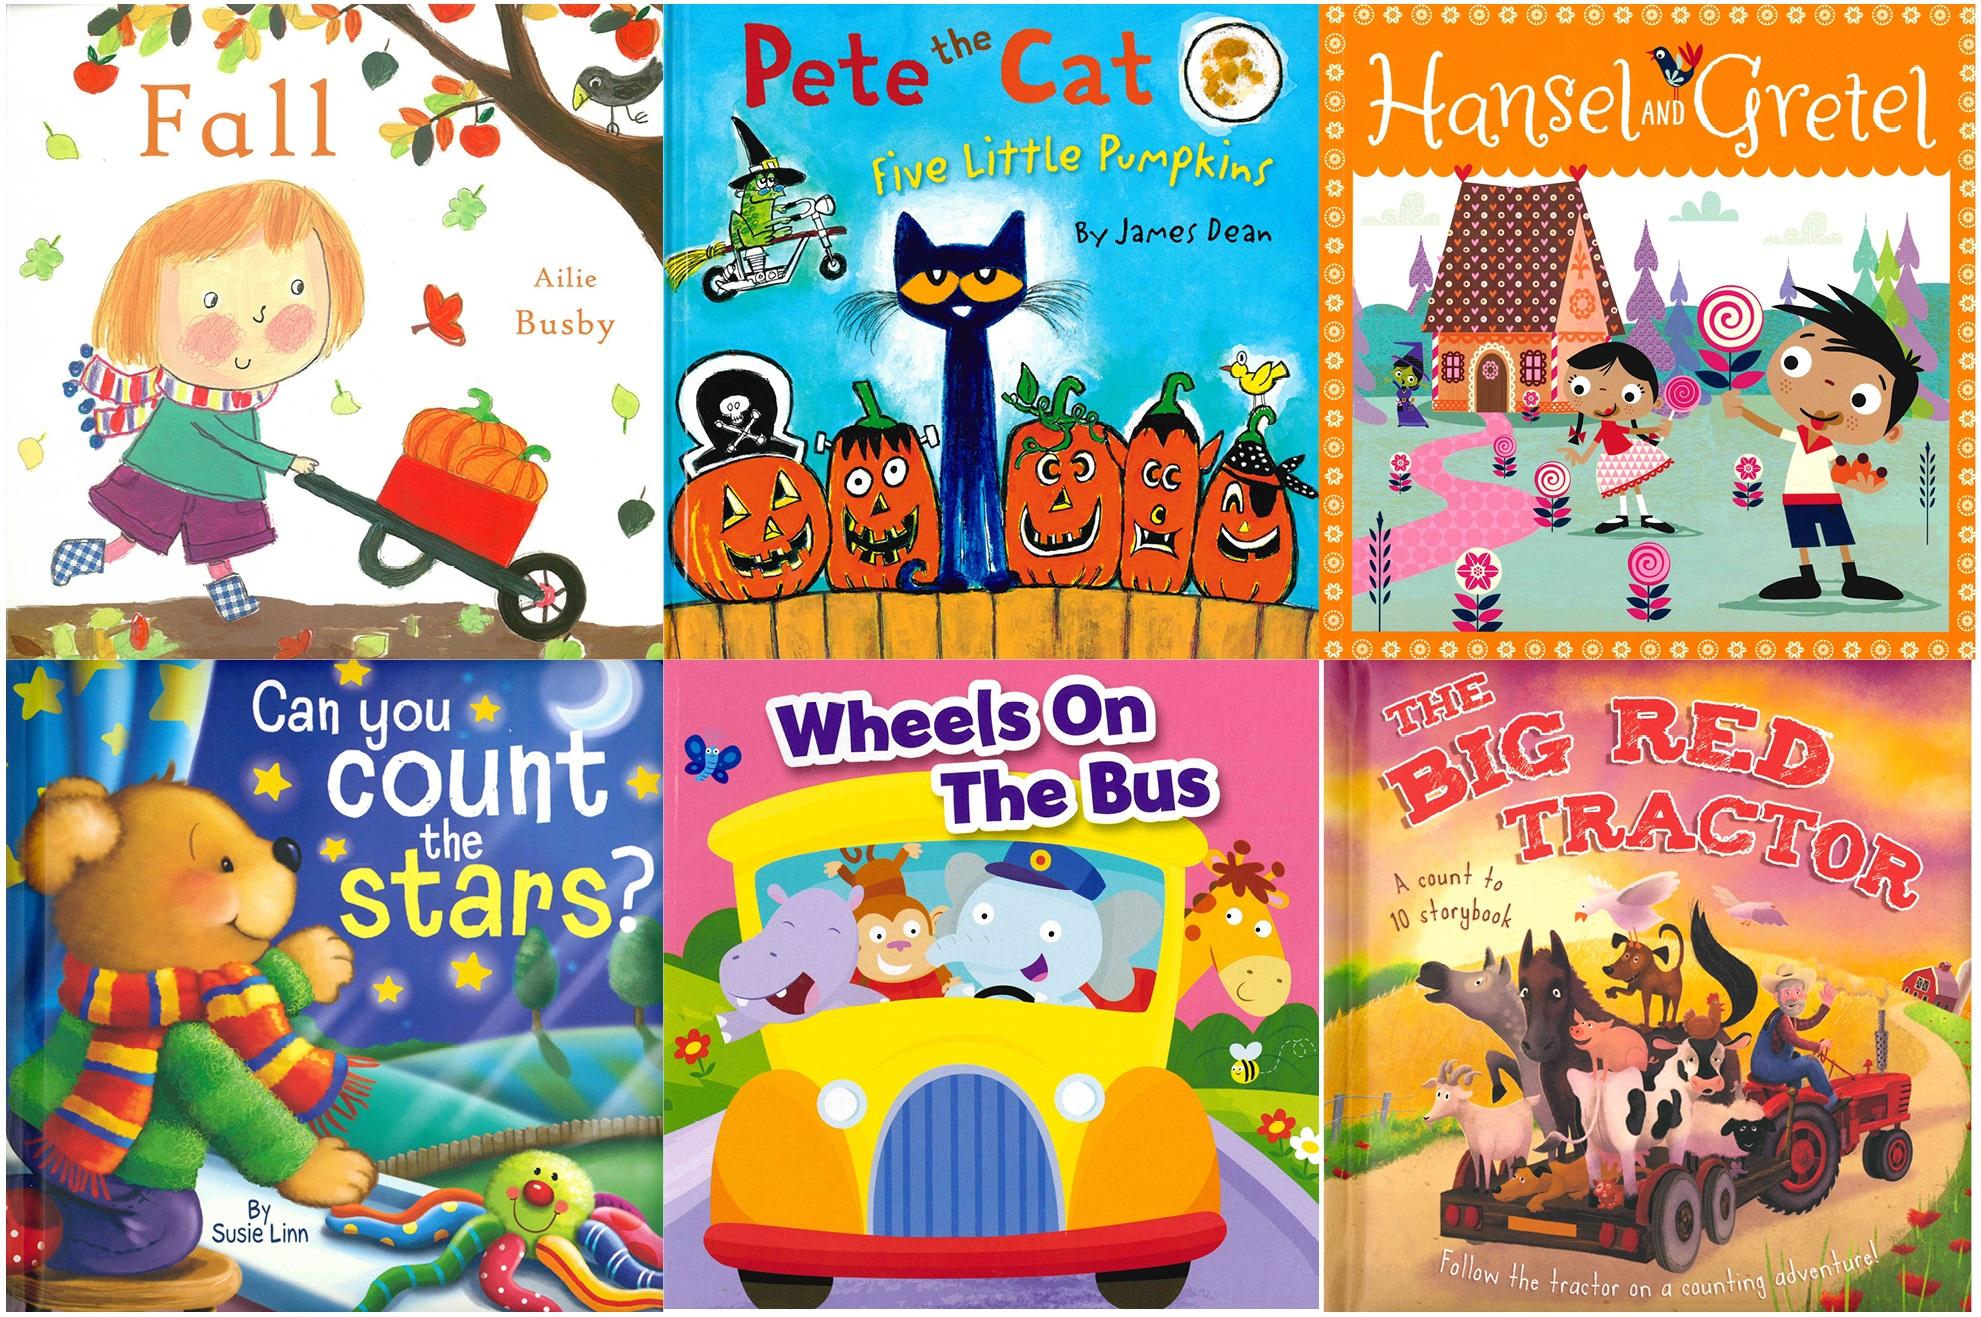 fall-reading-challenge-books-2019.jpg